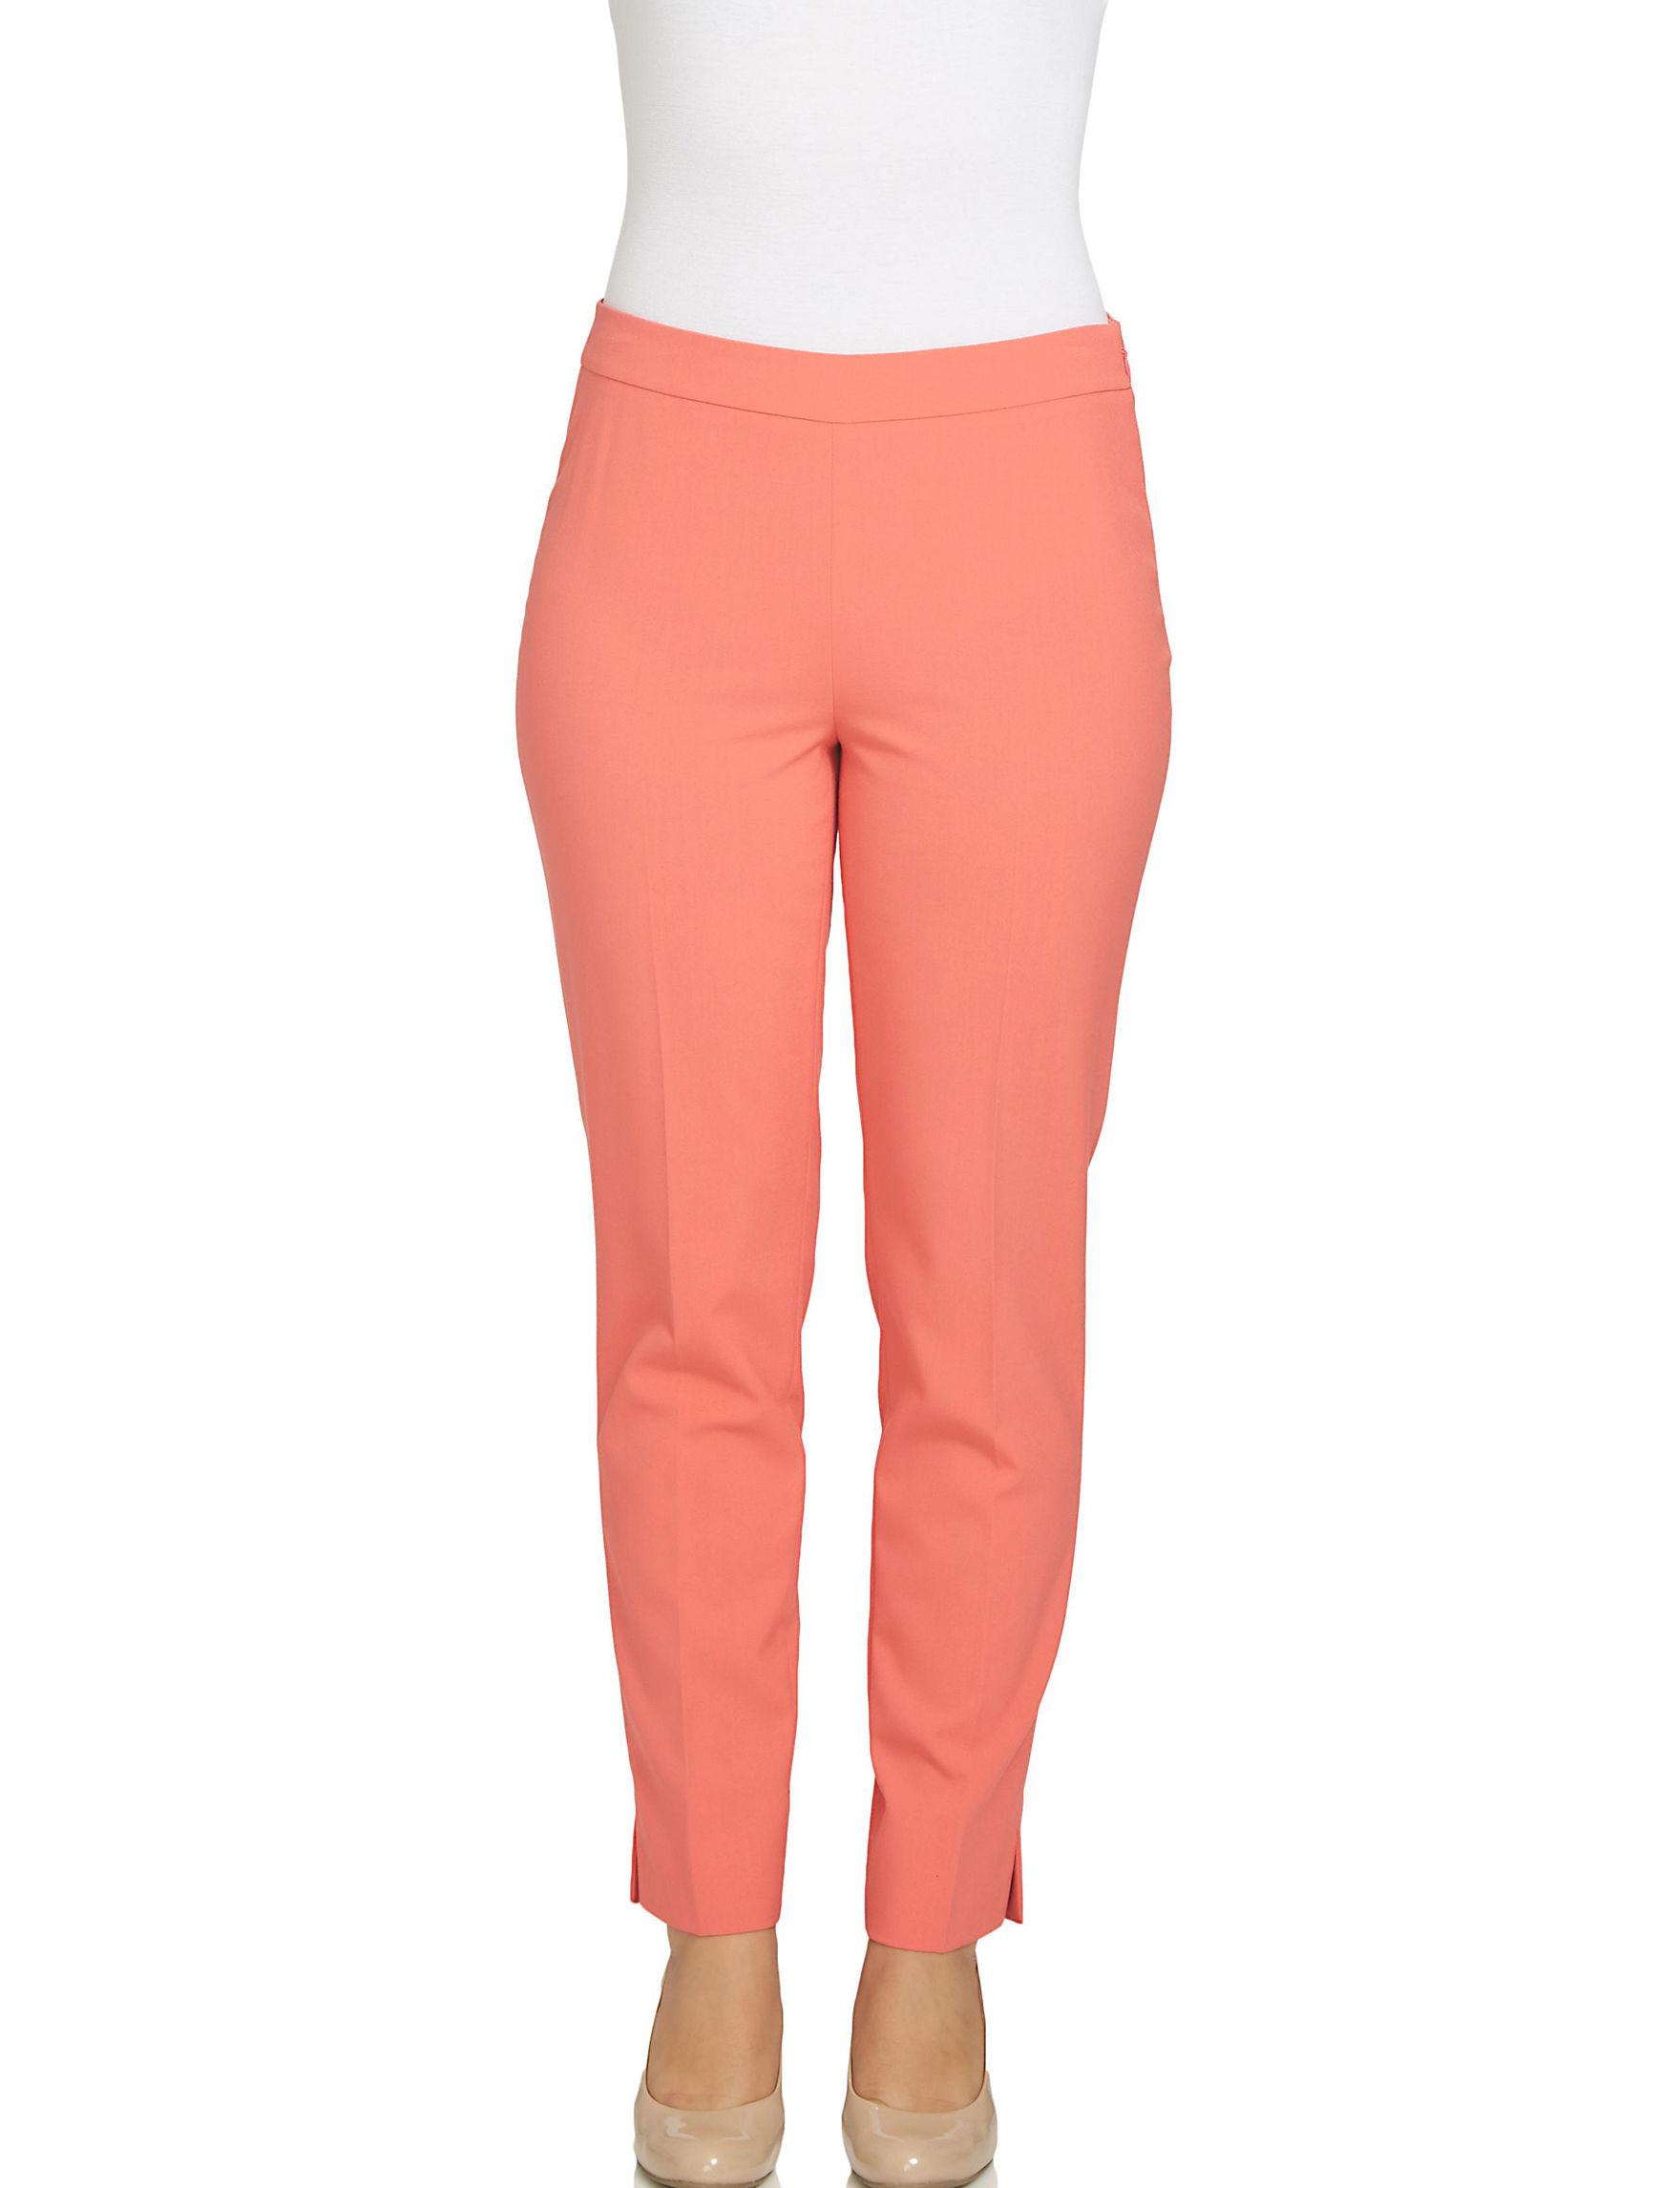 Chaus Coral Soft Pants